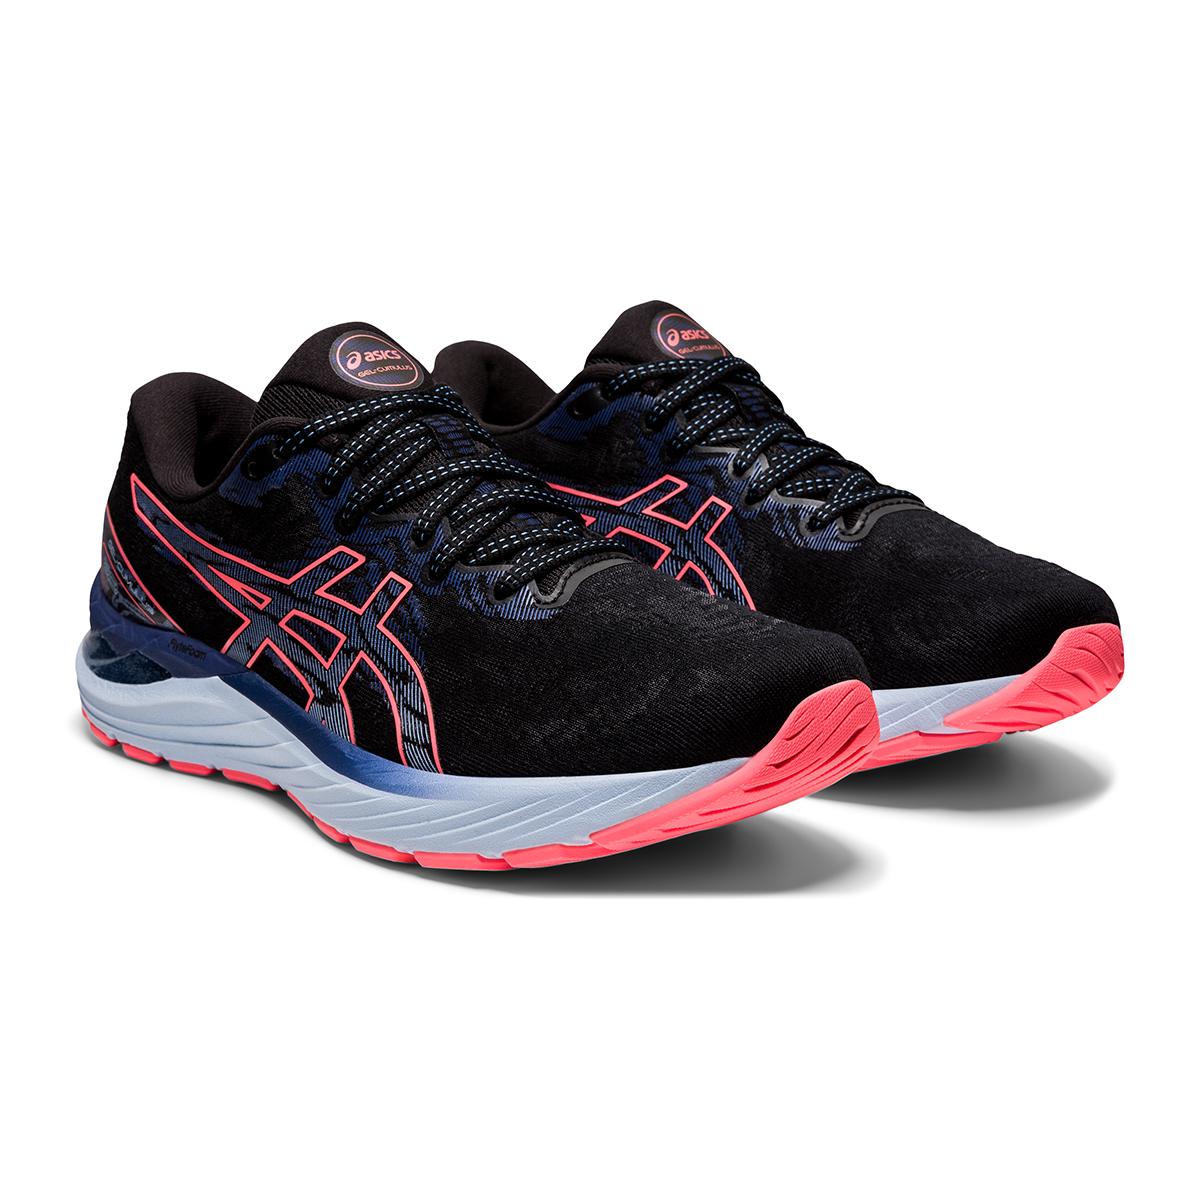 Women's Asics Gel-Cumulus 23 Running Shoe - Color: Black/Blazing Coral - Size: 5 - Width: Regular, Black/Blazing Coral, large, image 3